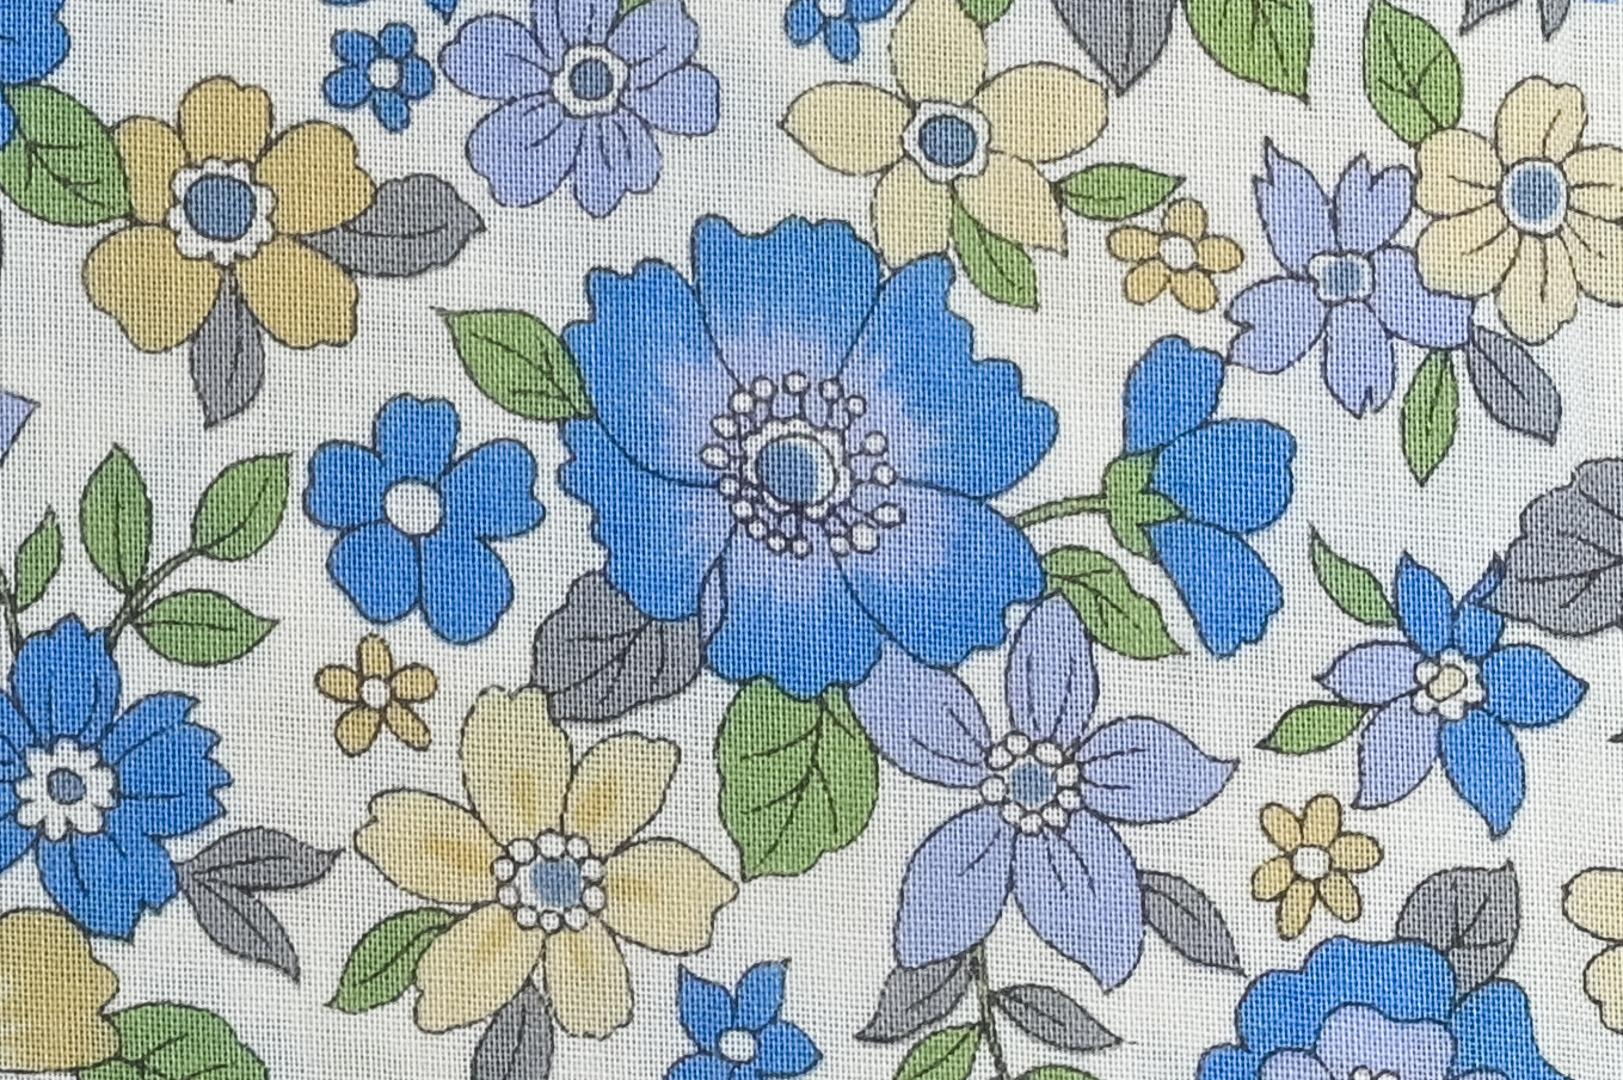 1 mètre de biais fleuri en coton